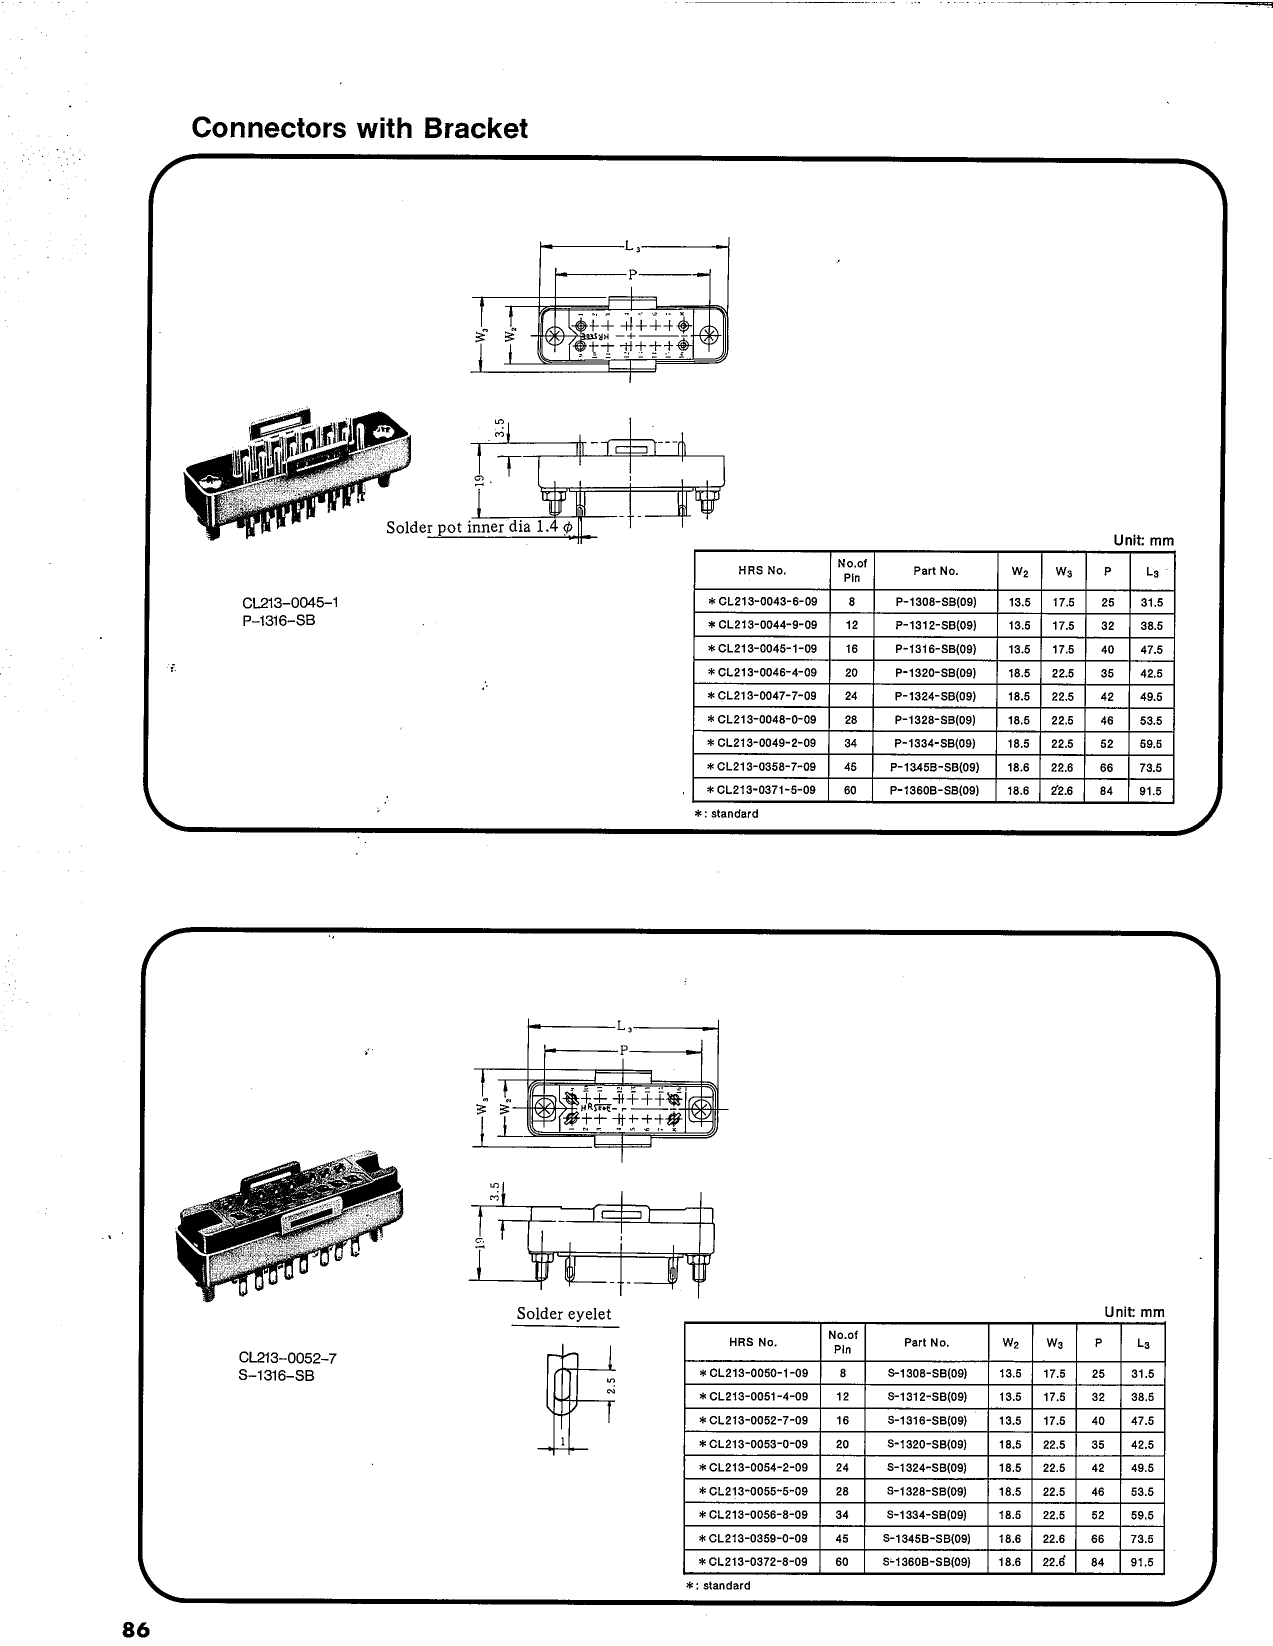 P-1360W-CT pdf